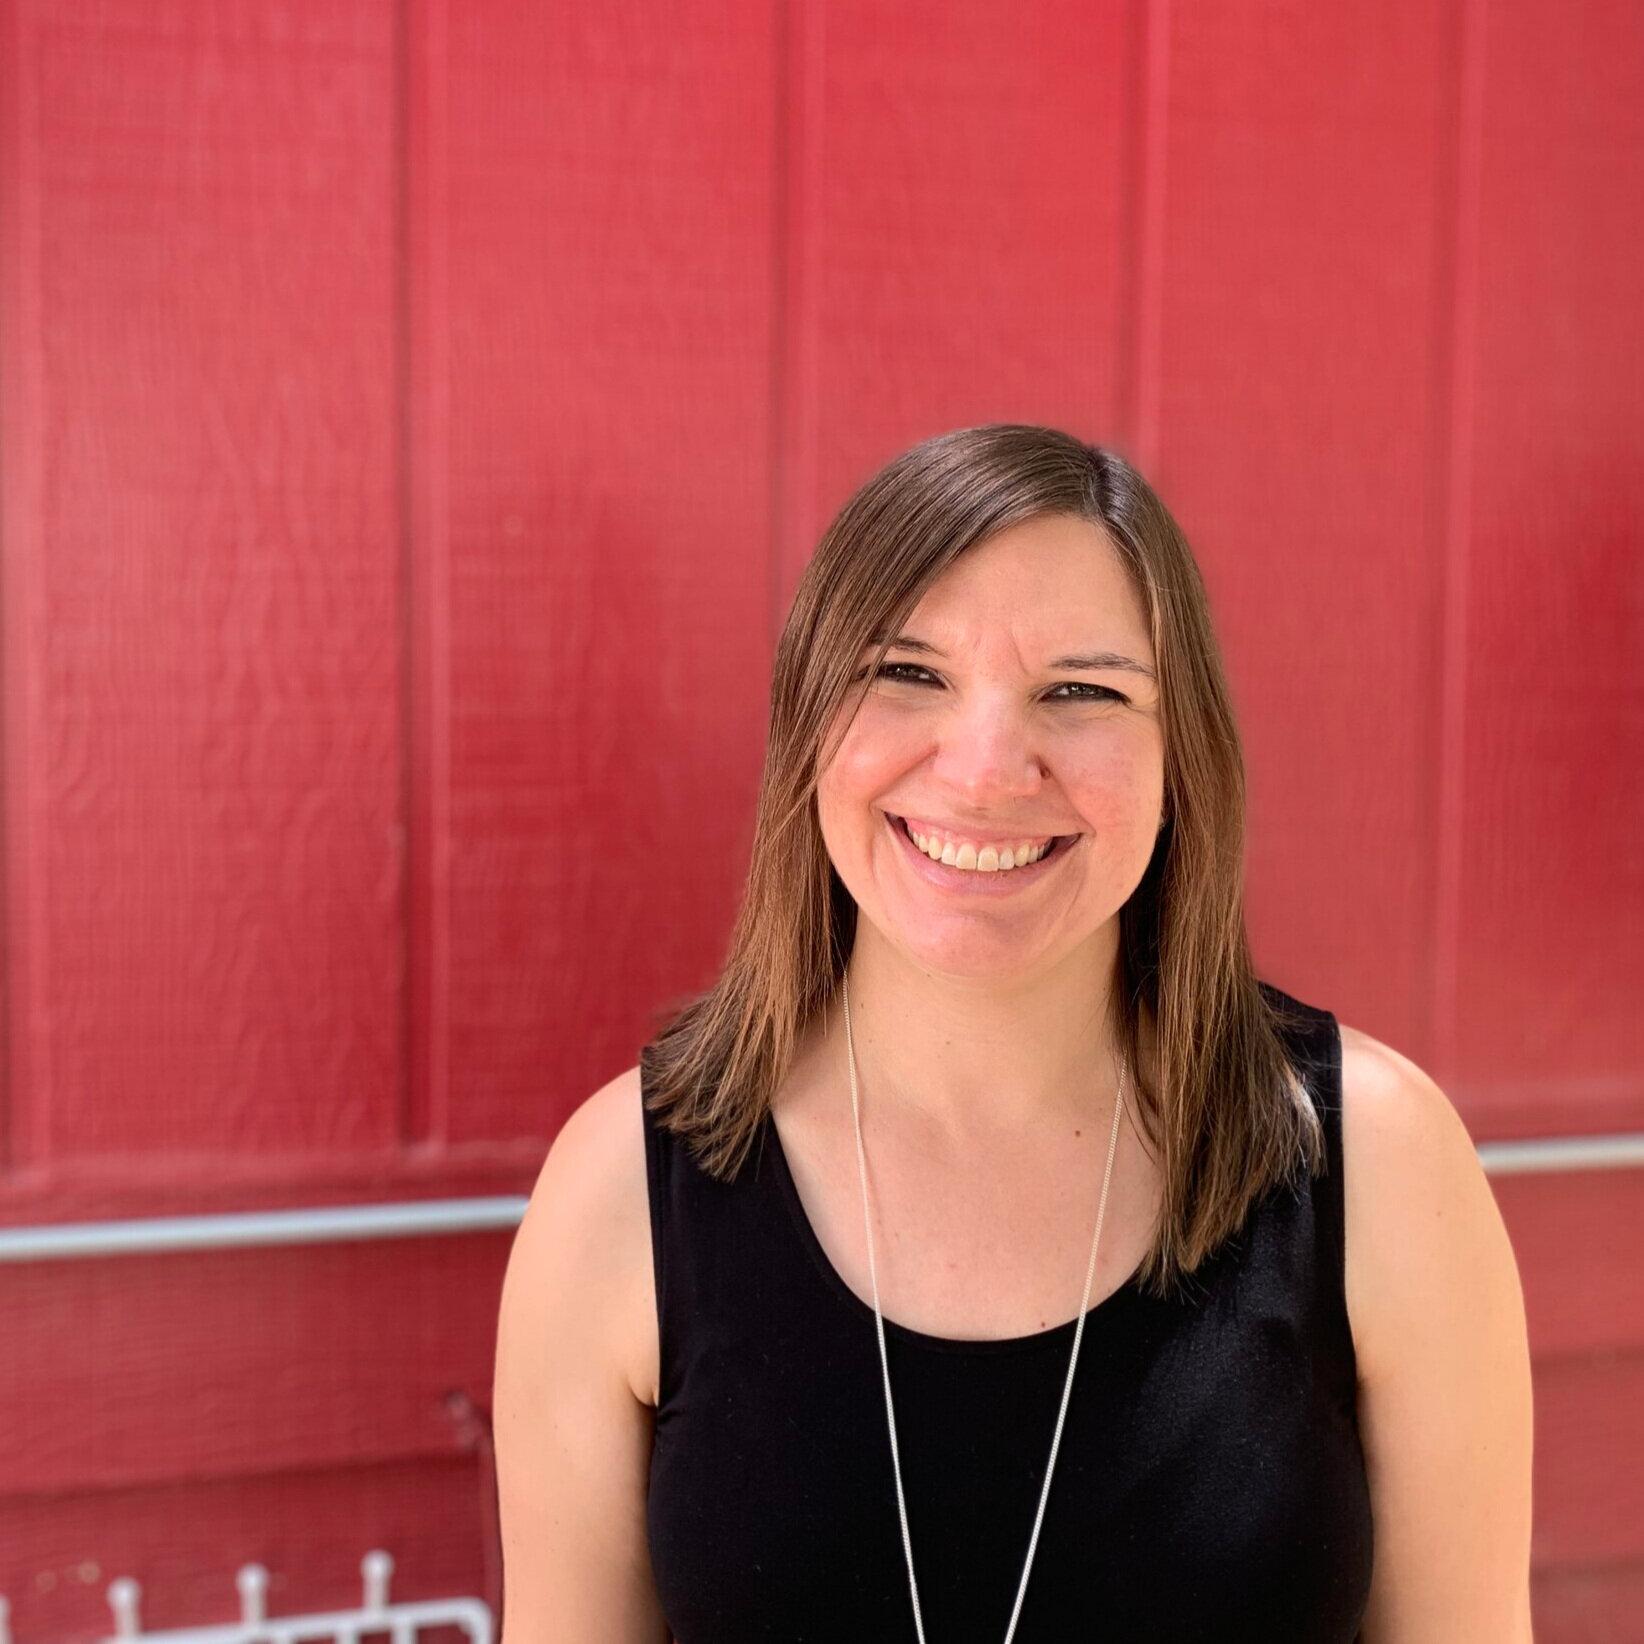 Bree Schafer Pacheco,  Preschool Director